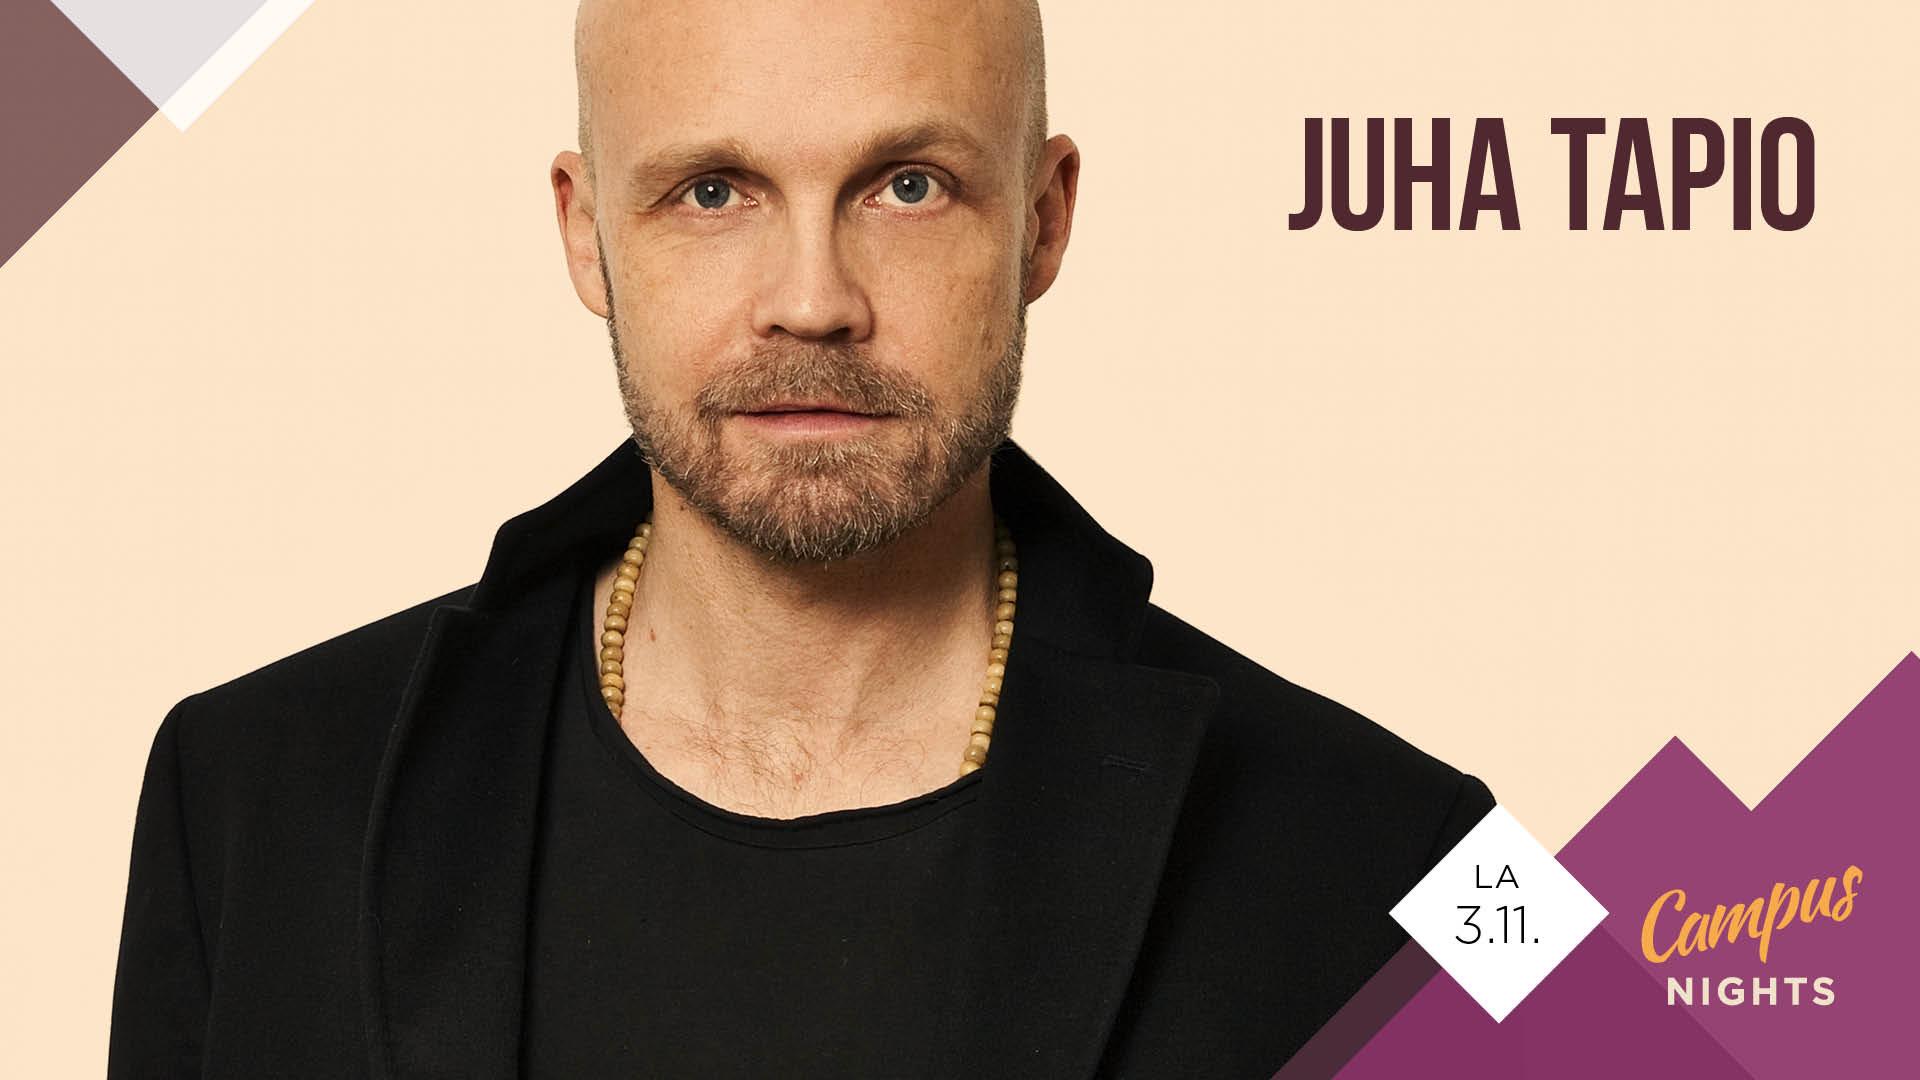 Juha-Tapio